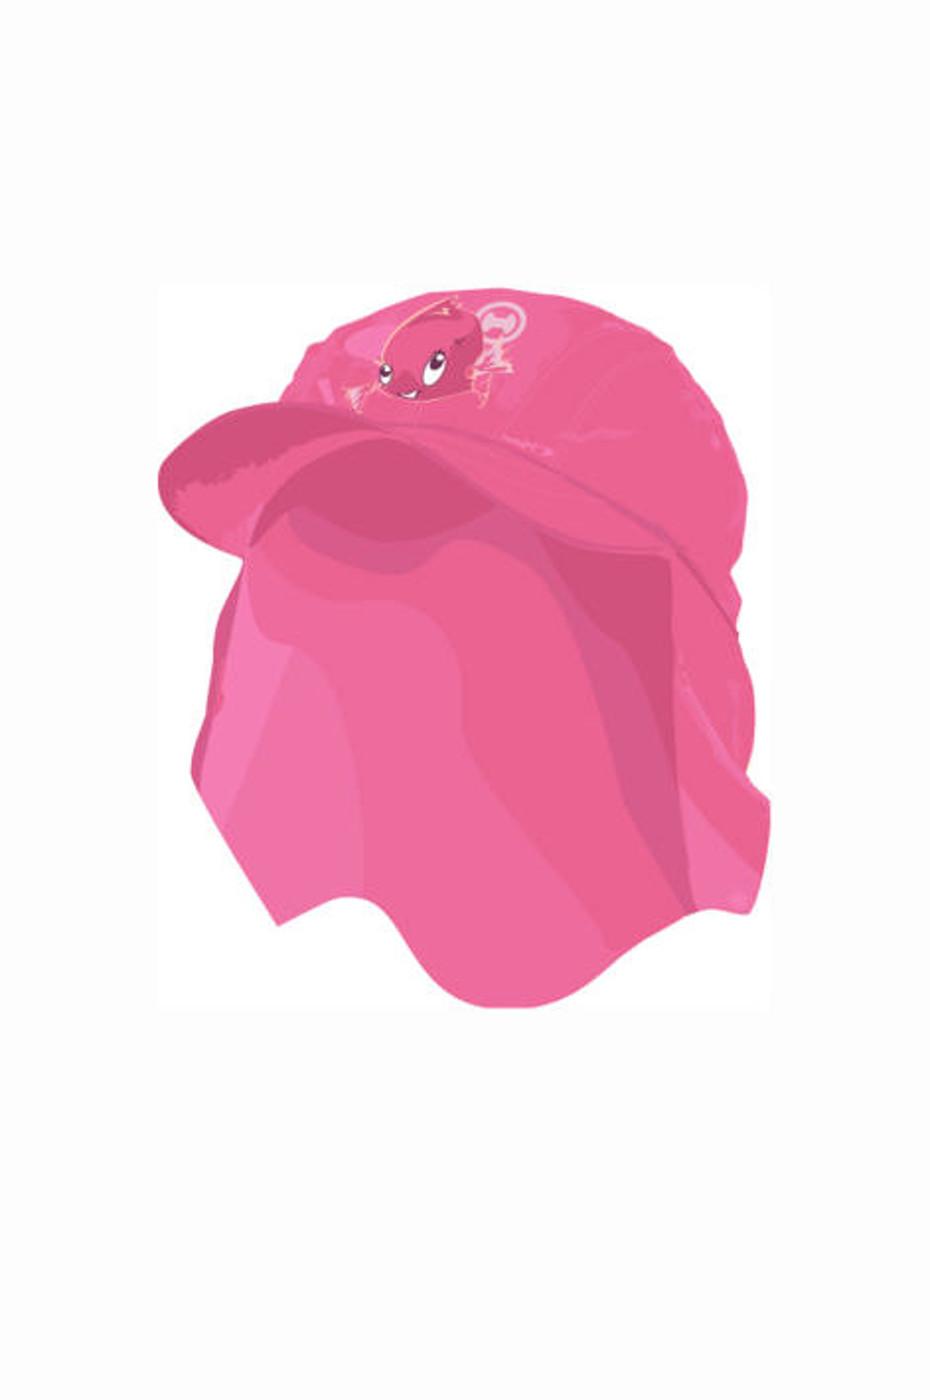 HYPHEN UV-Schutz TOOLZ Kappe - Kinder